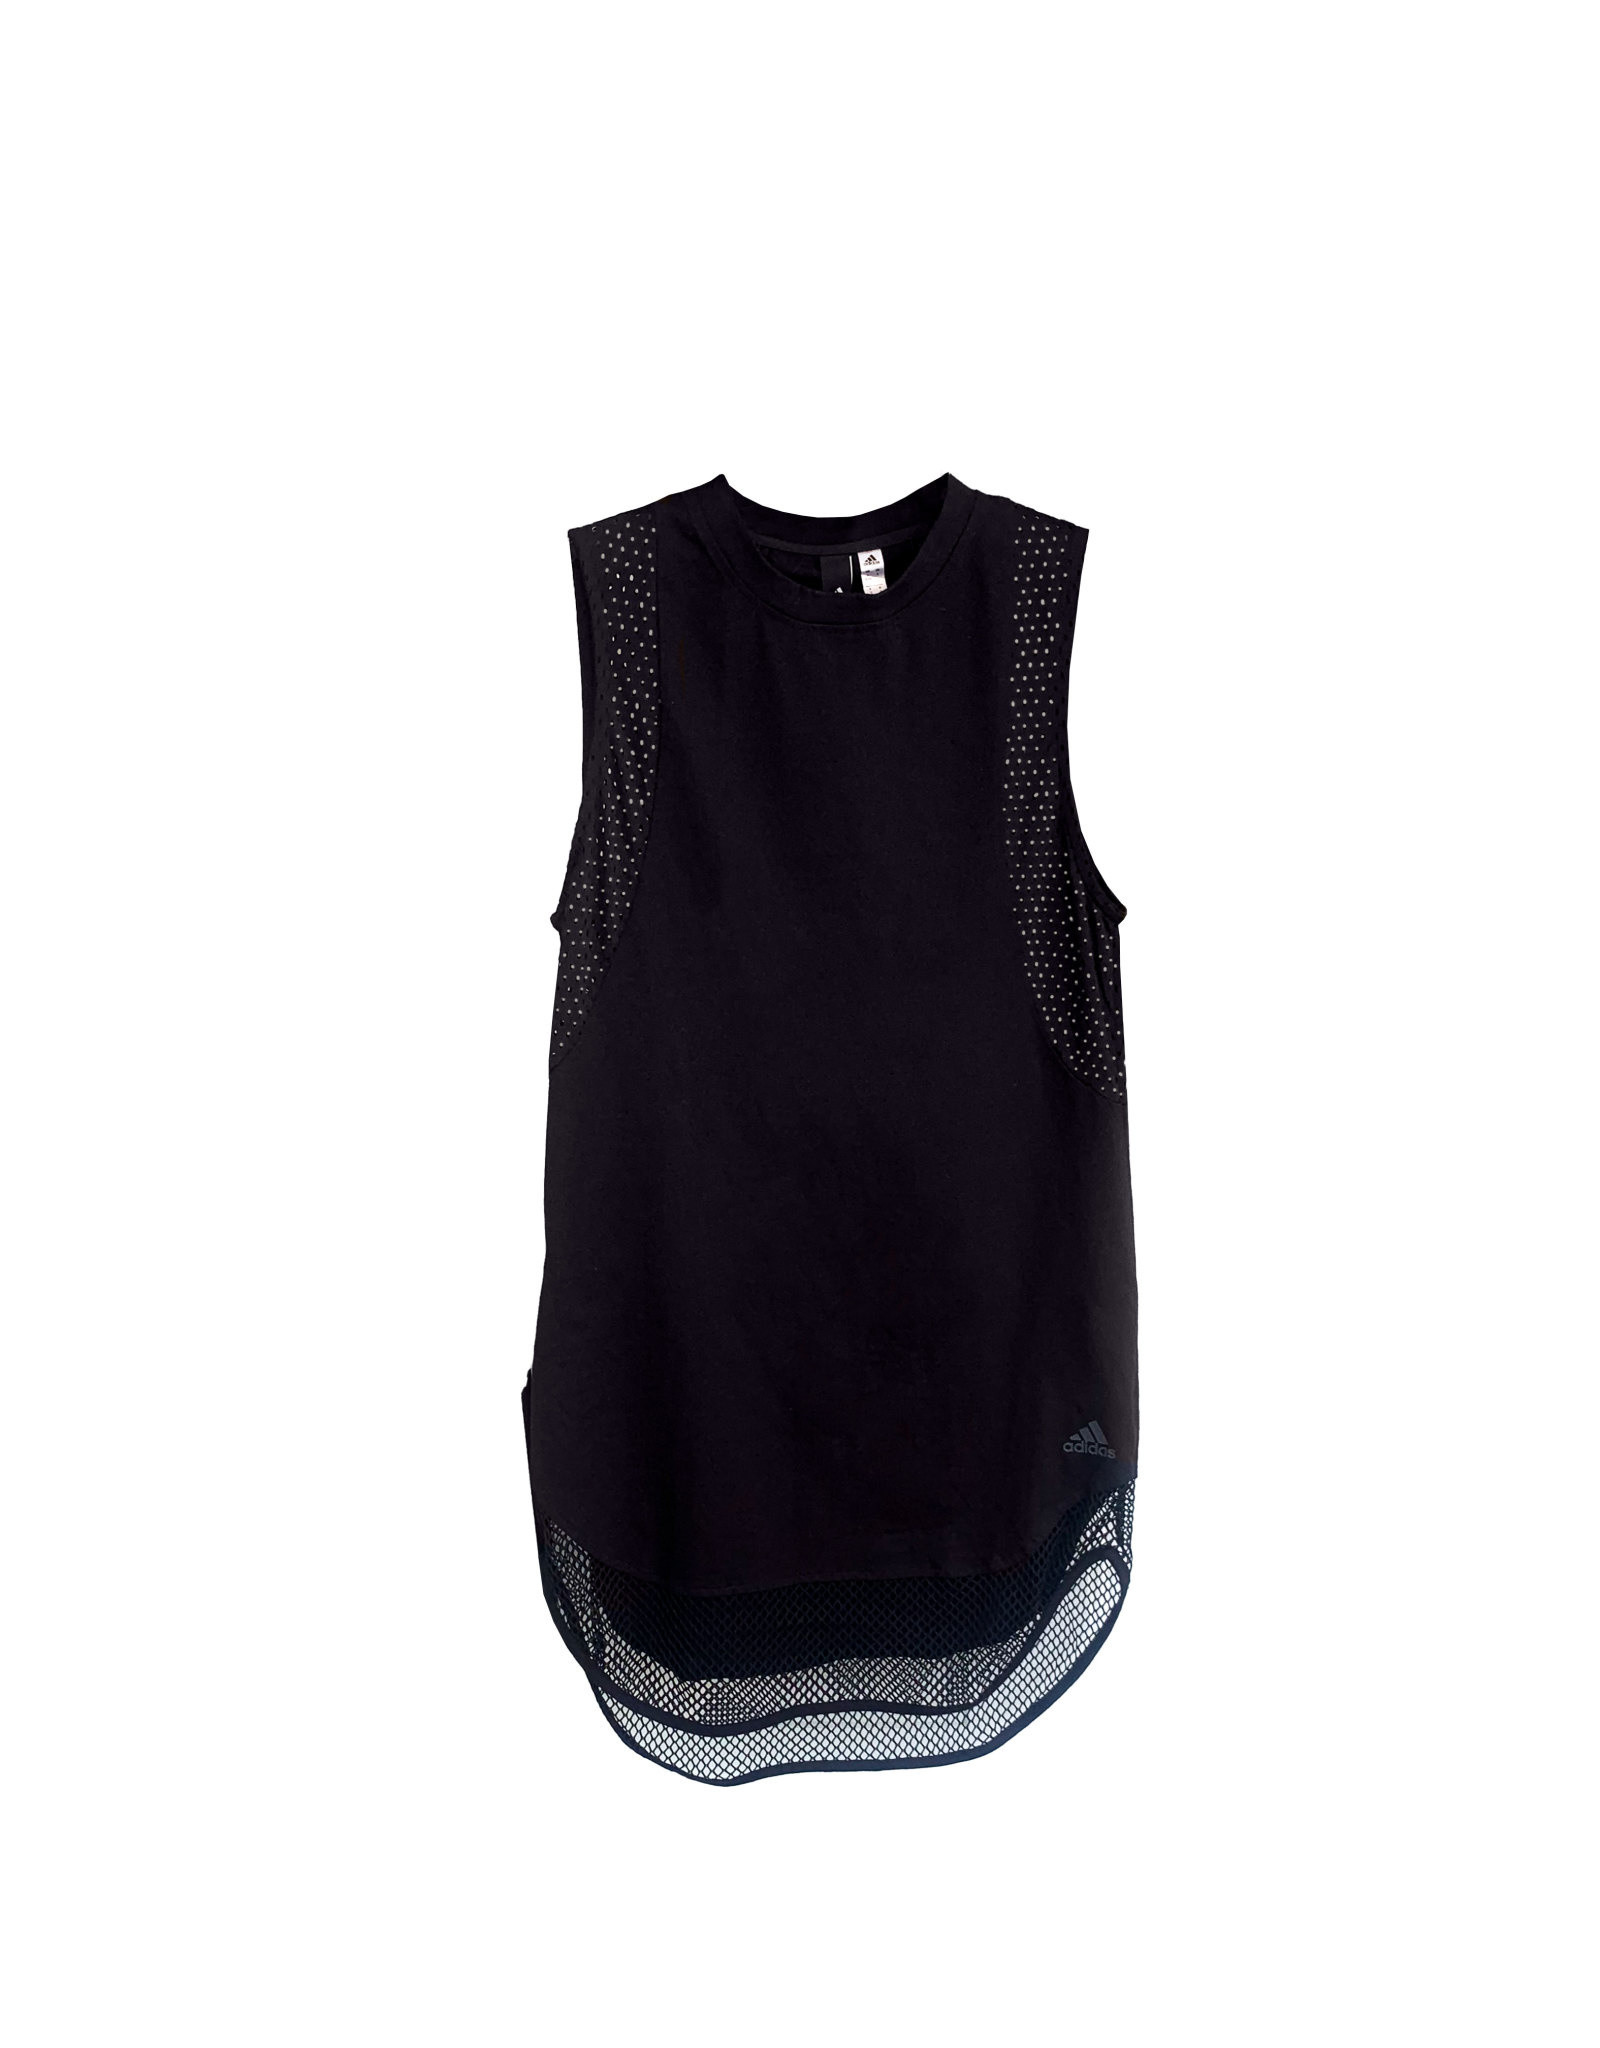 Adidas Adidas Lace Tshirt   Dress Size S